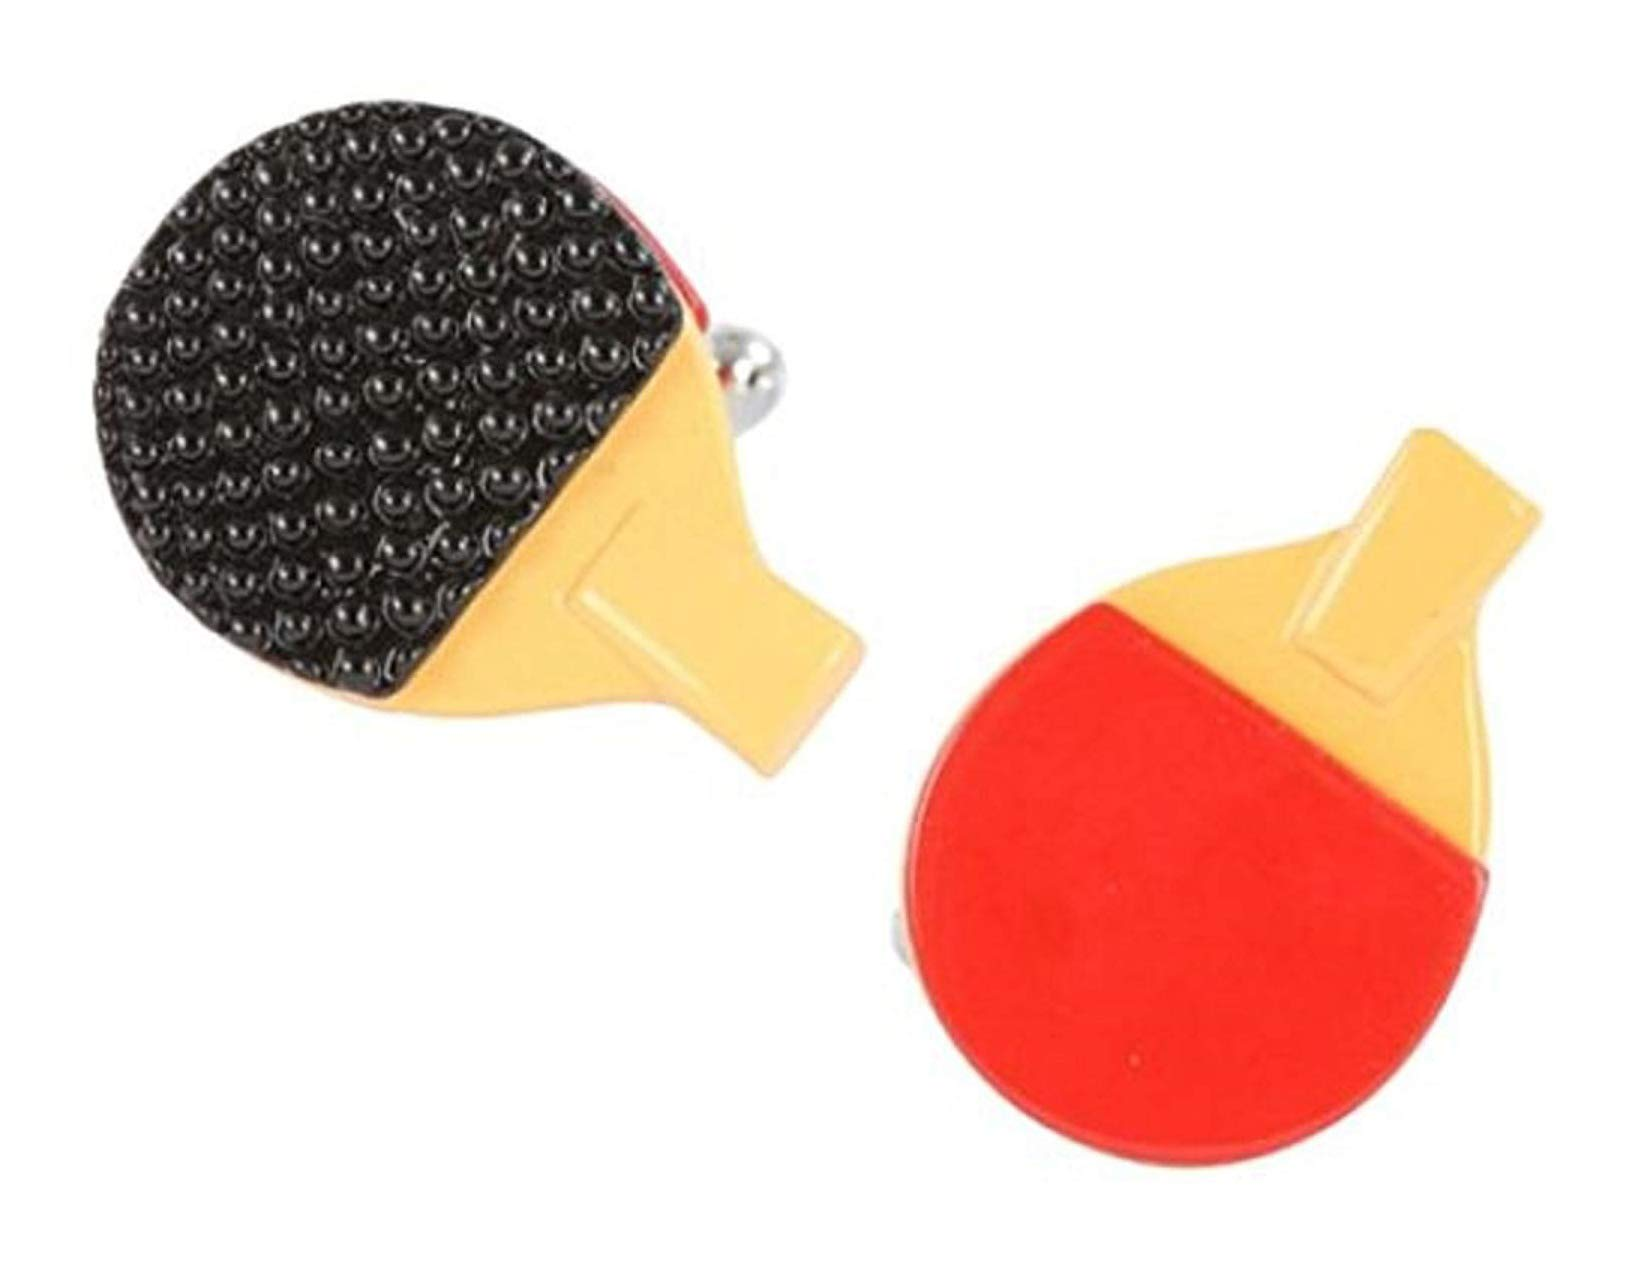 The Jewelbox Sports Table Tennis Bat Red Black Brass Formal Shirt Blazer Suit Cufflinks Pair Men Gift Box